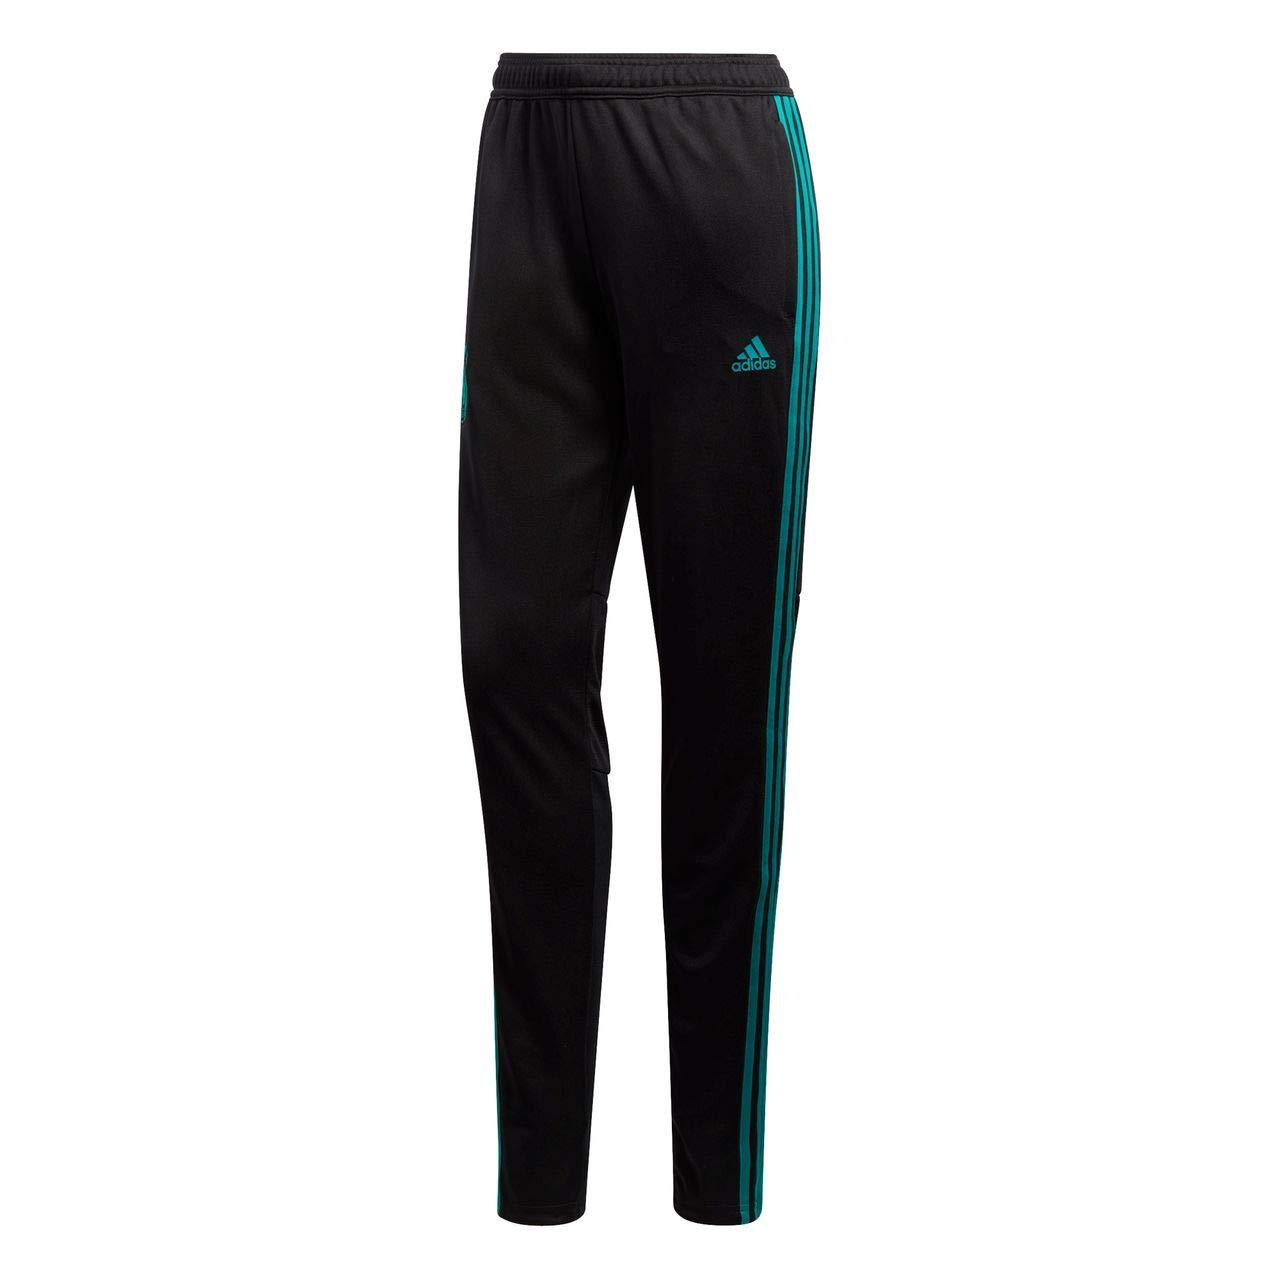 Adidas Damen DFB Training Pants Trainingshose